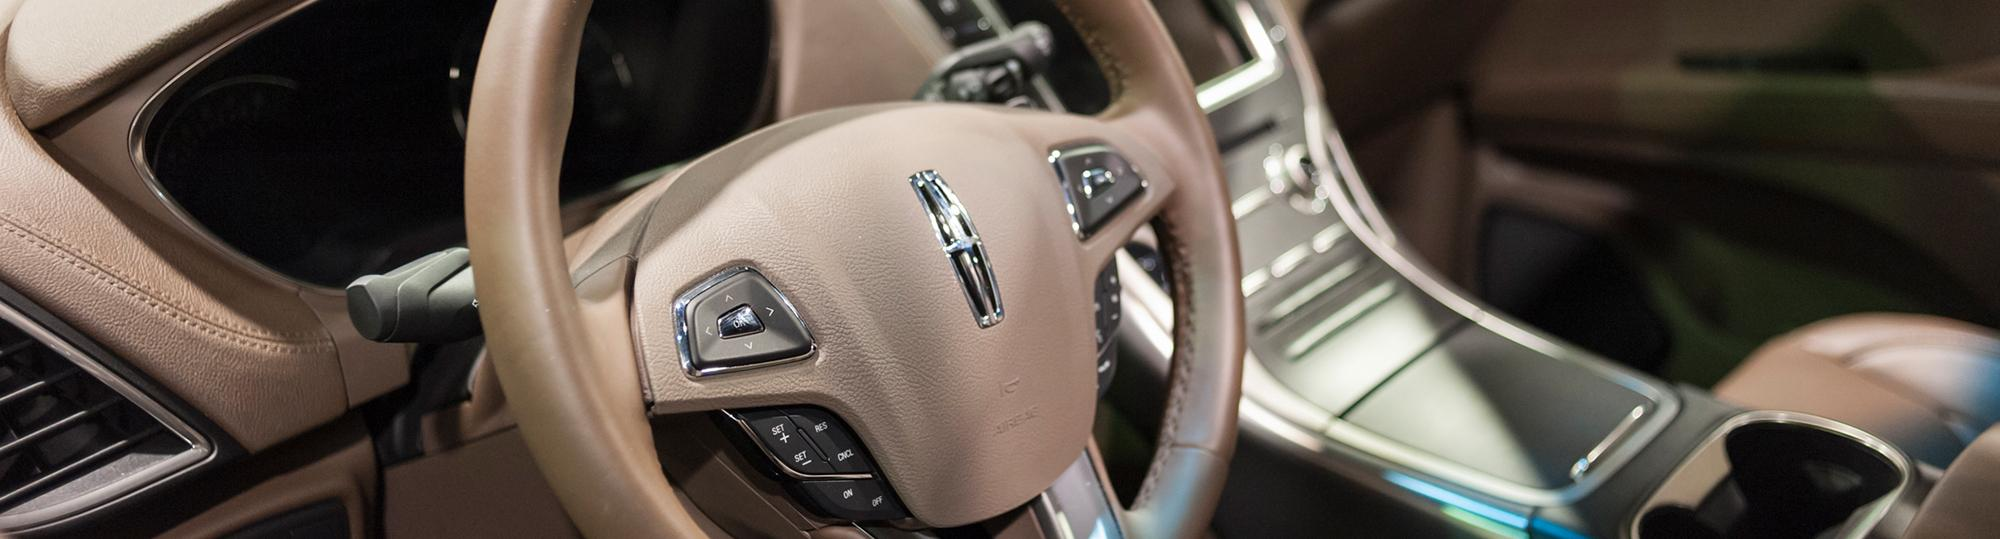 lincoln deal hero interior of car